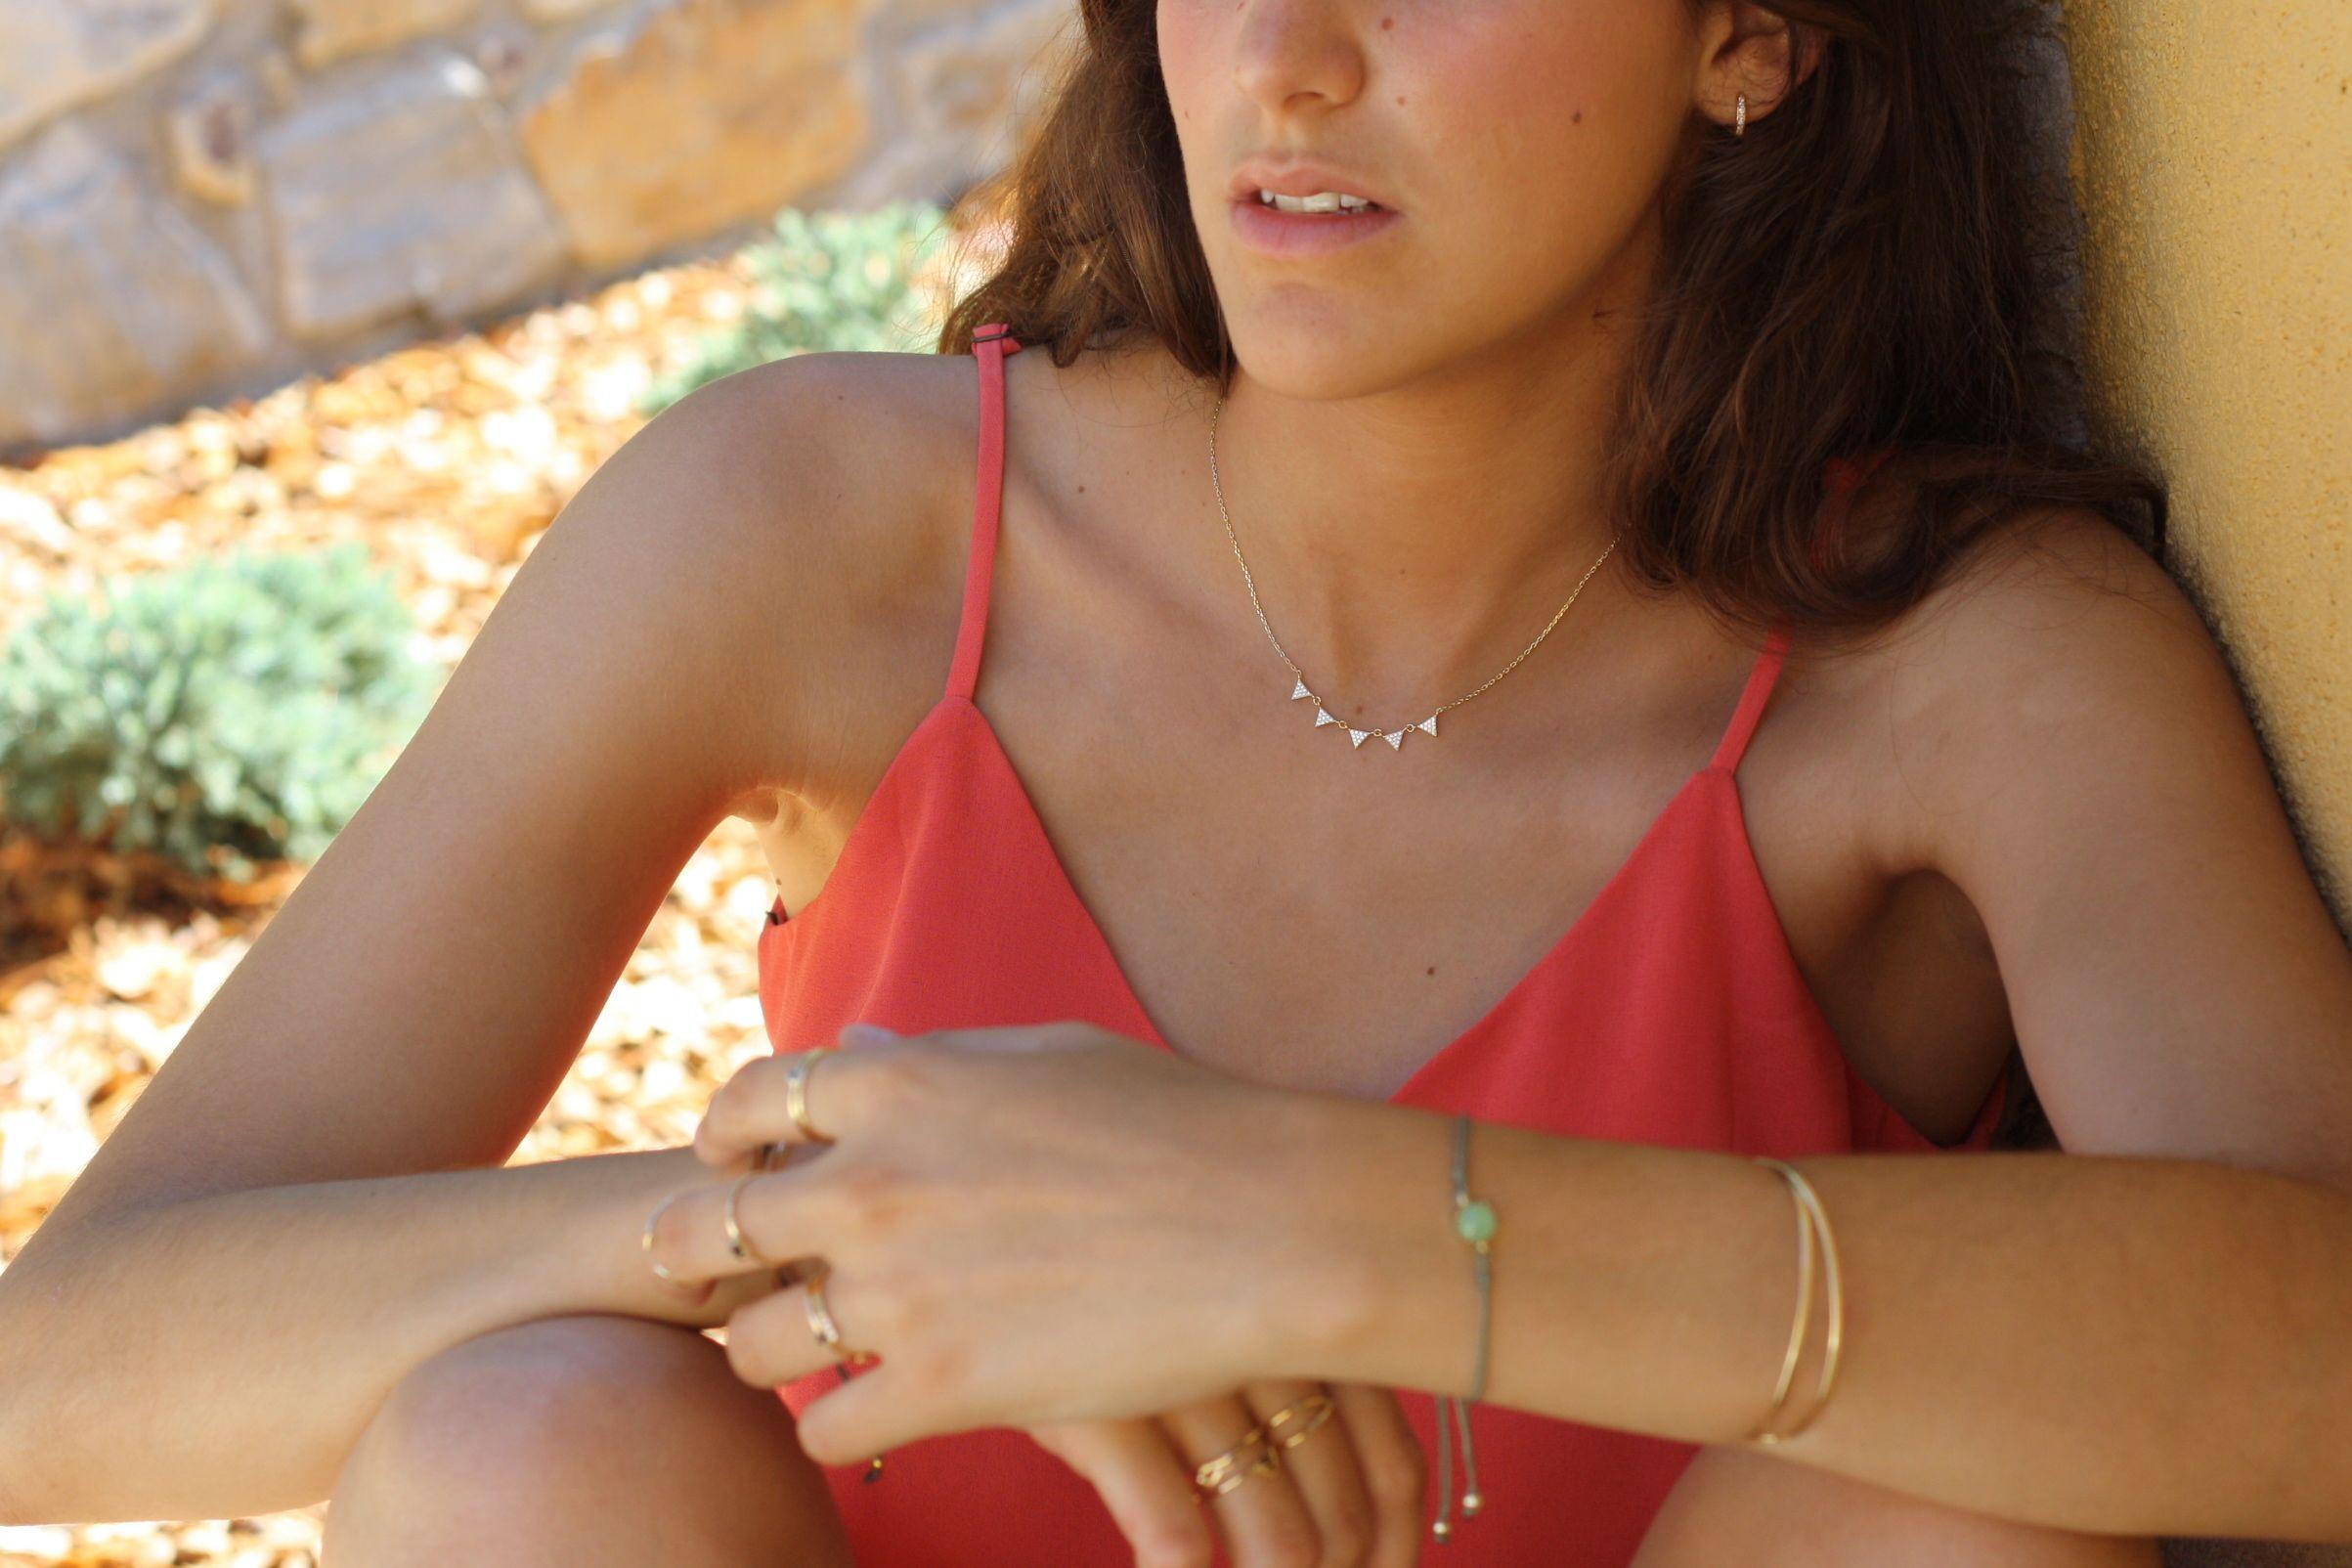 Collar triangulos20161201 14858 15h48ig